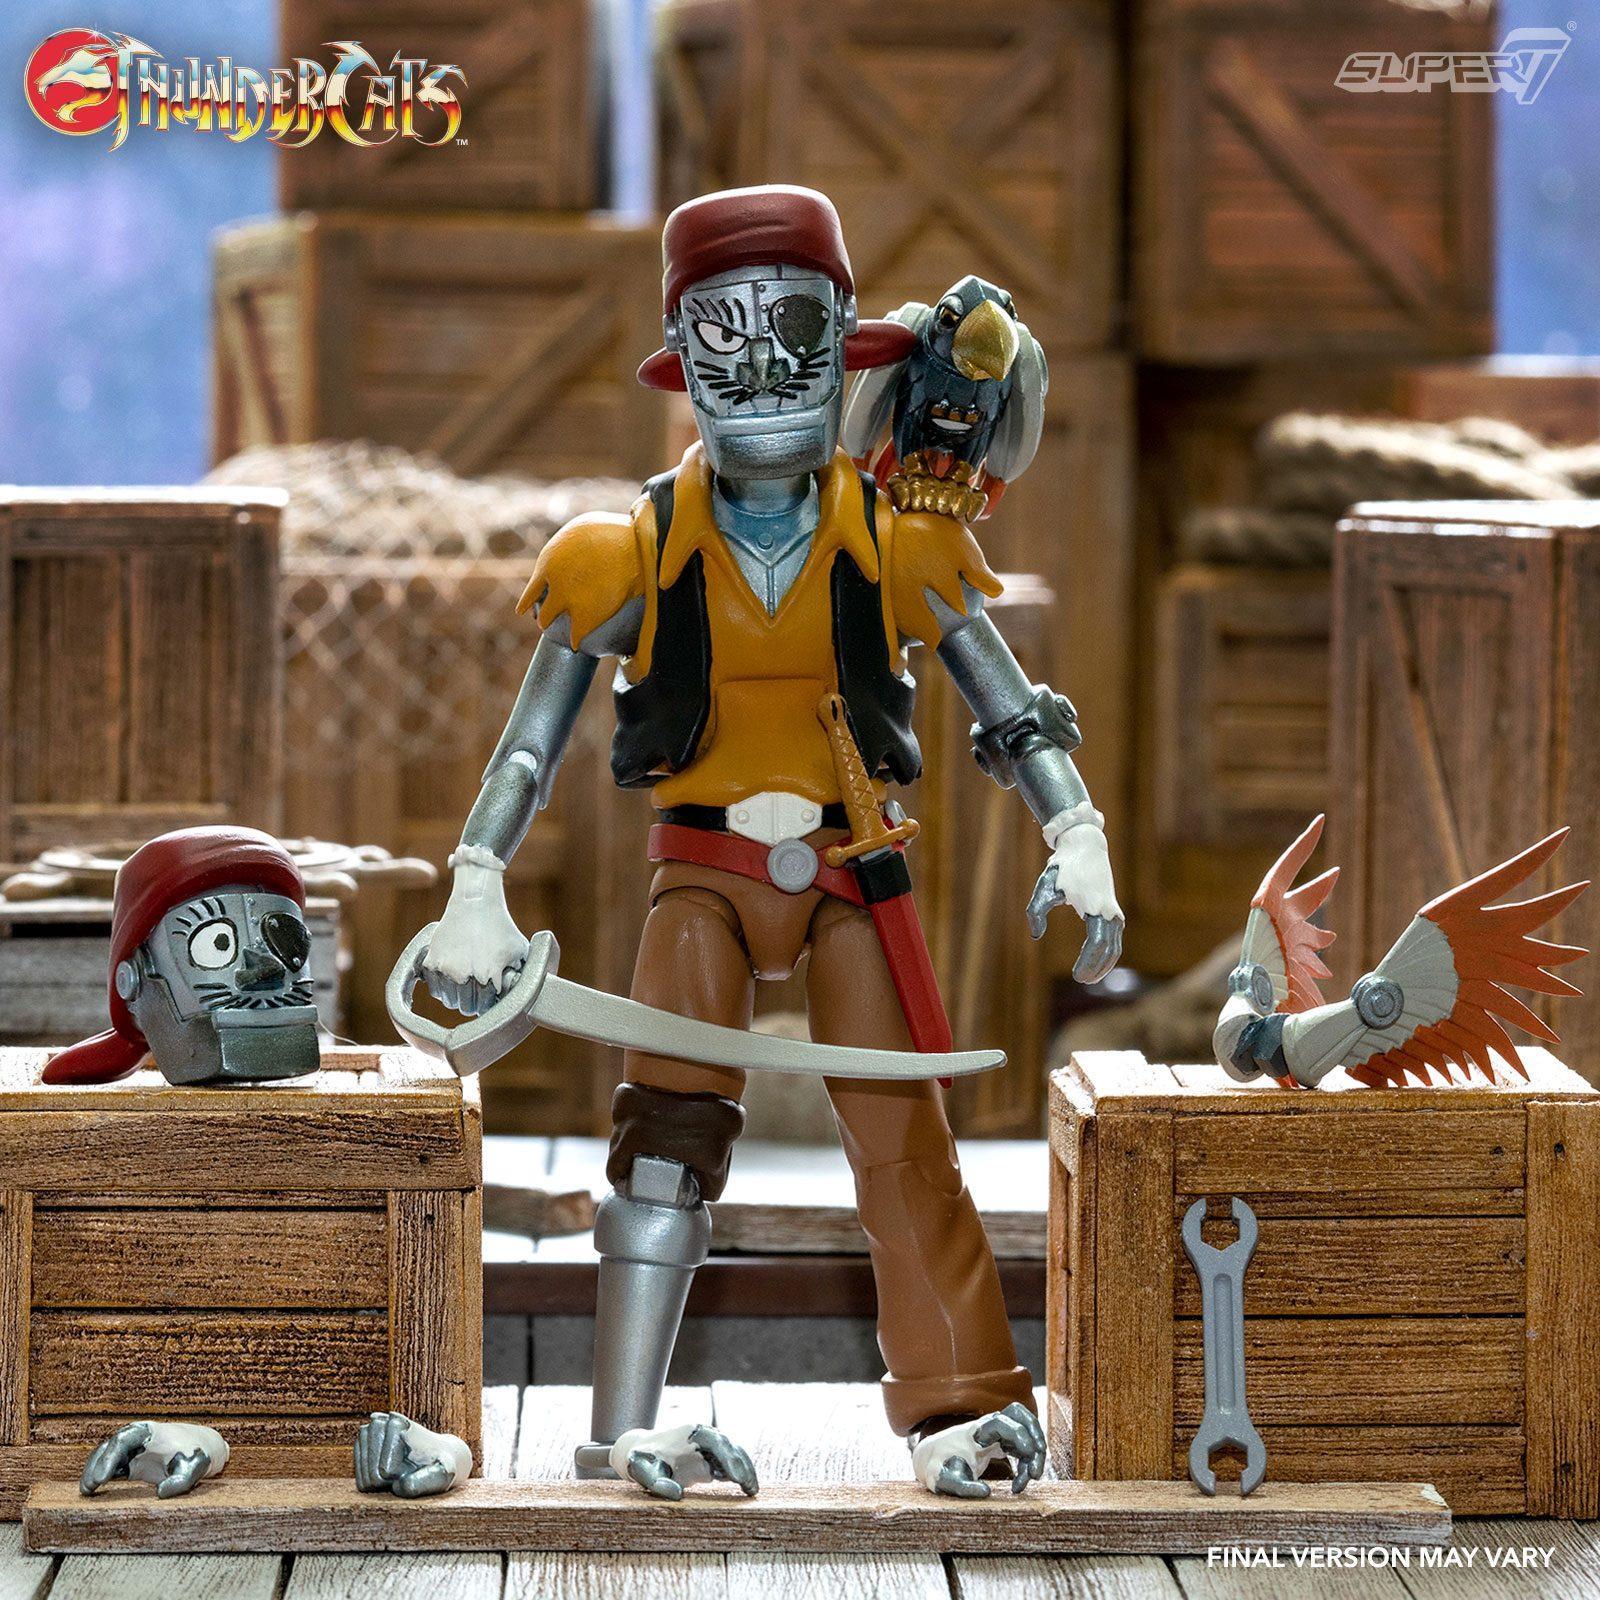 Super7 thundercats wave 3 figurine ultimates captain cracker the robotic pirate suukoo toys